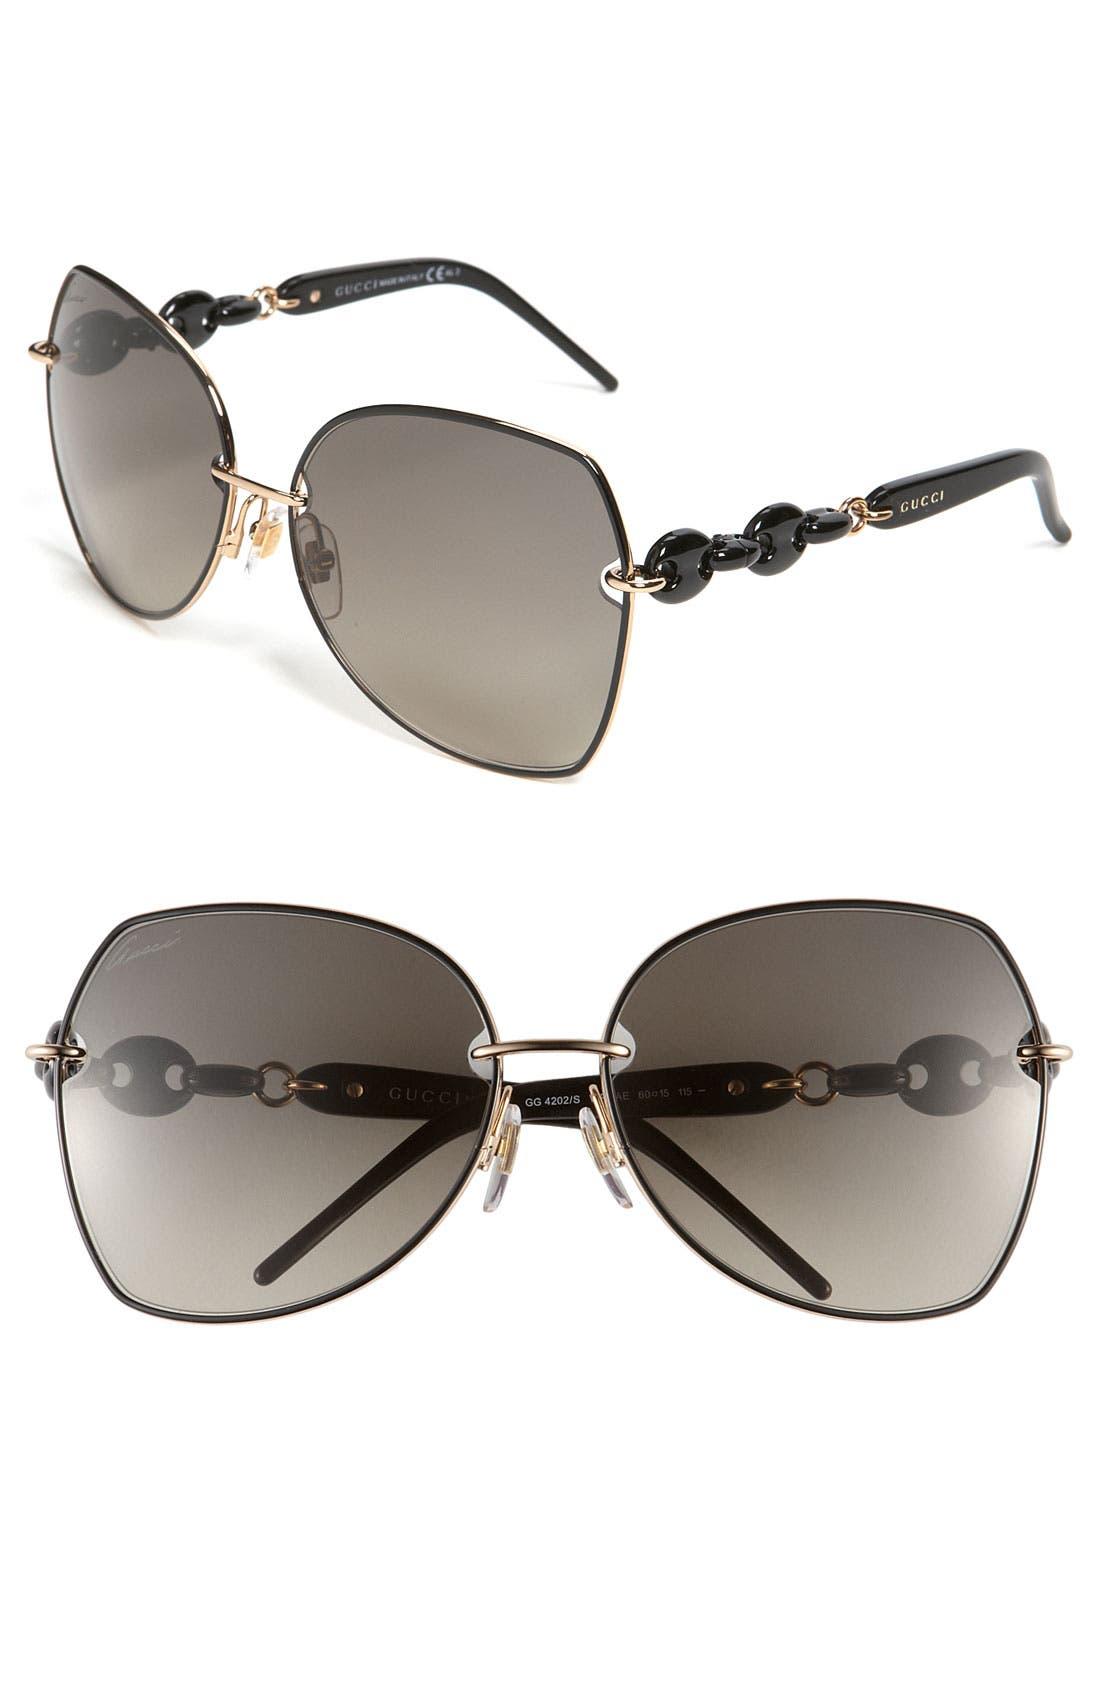 Alternate Image 1 Selected - Gucci 60mm 'Italian Collection' Retro Sunglasses